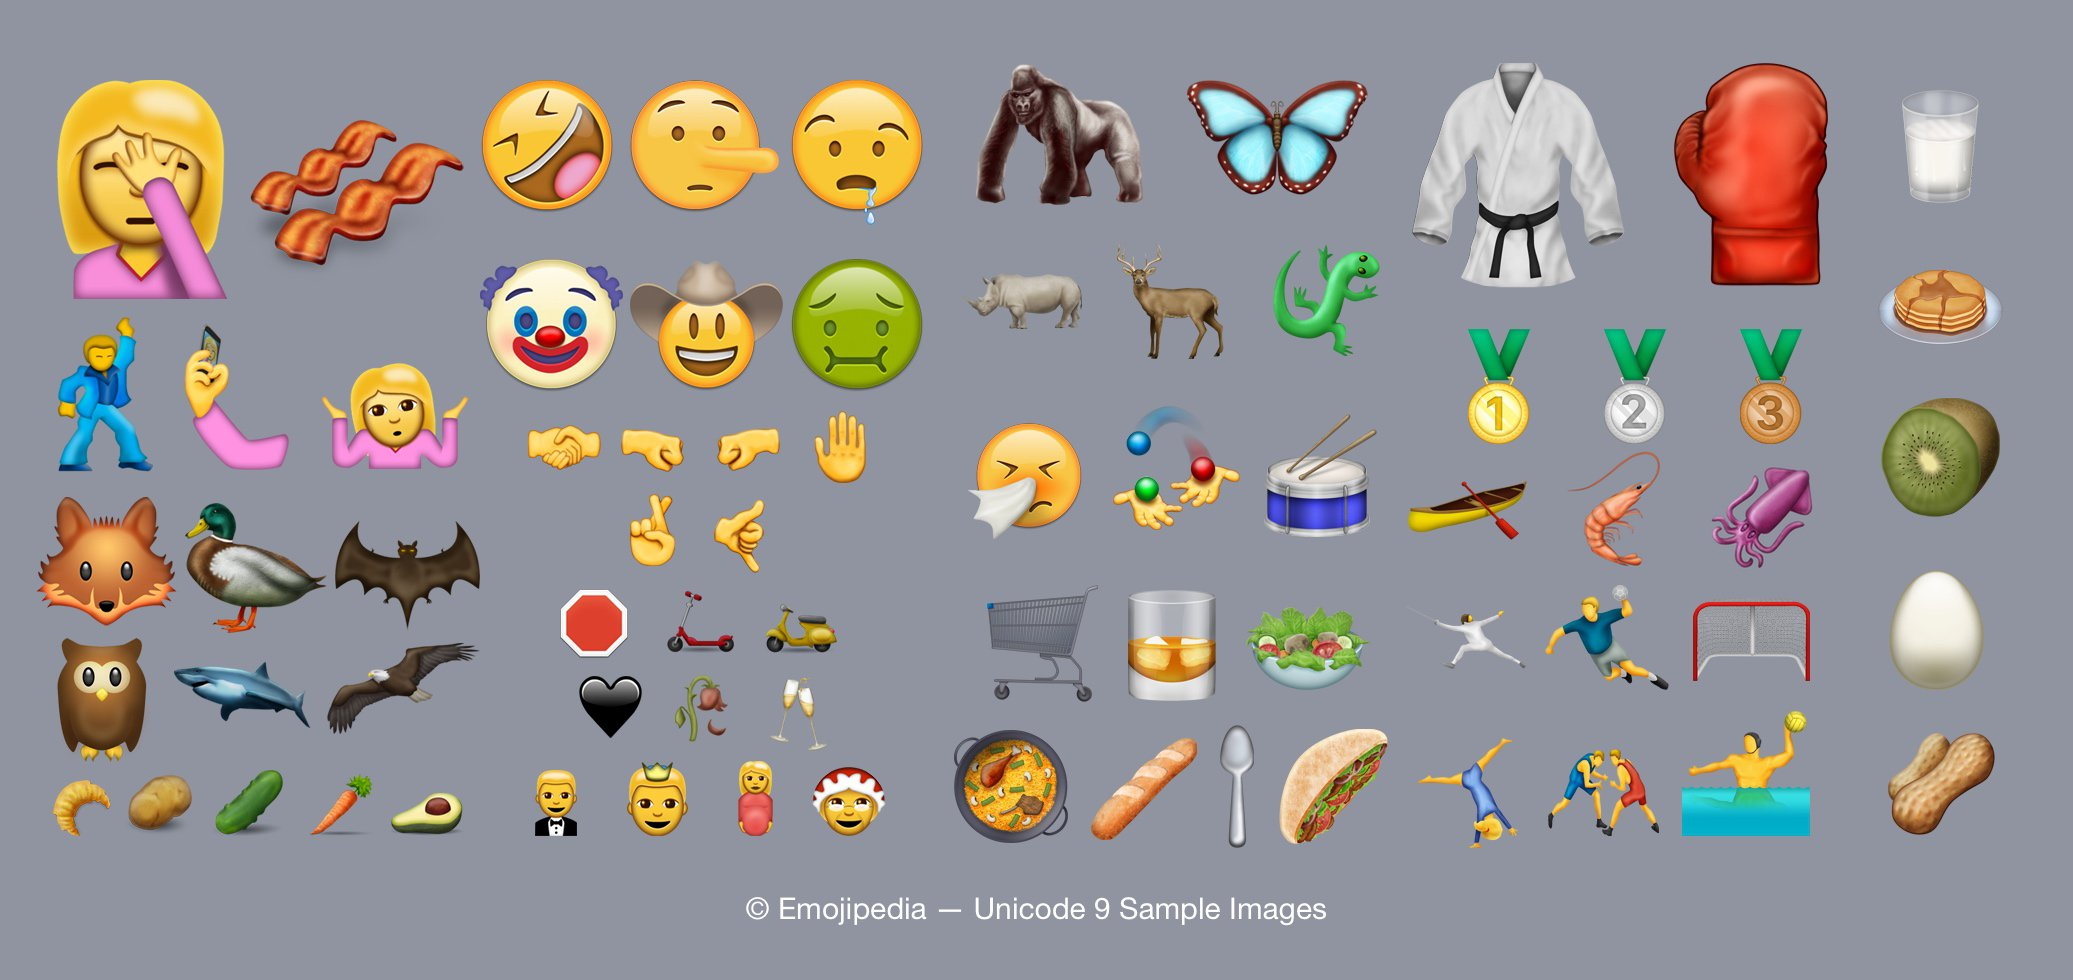 emojipedia-unicode-9-sample-images